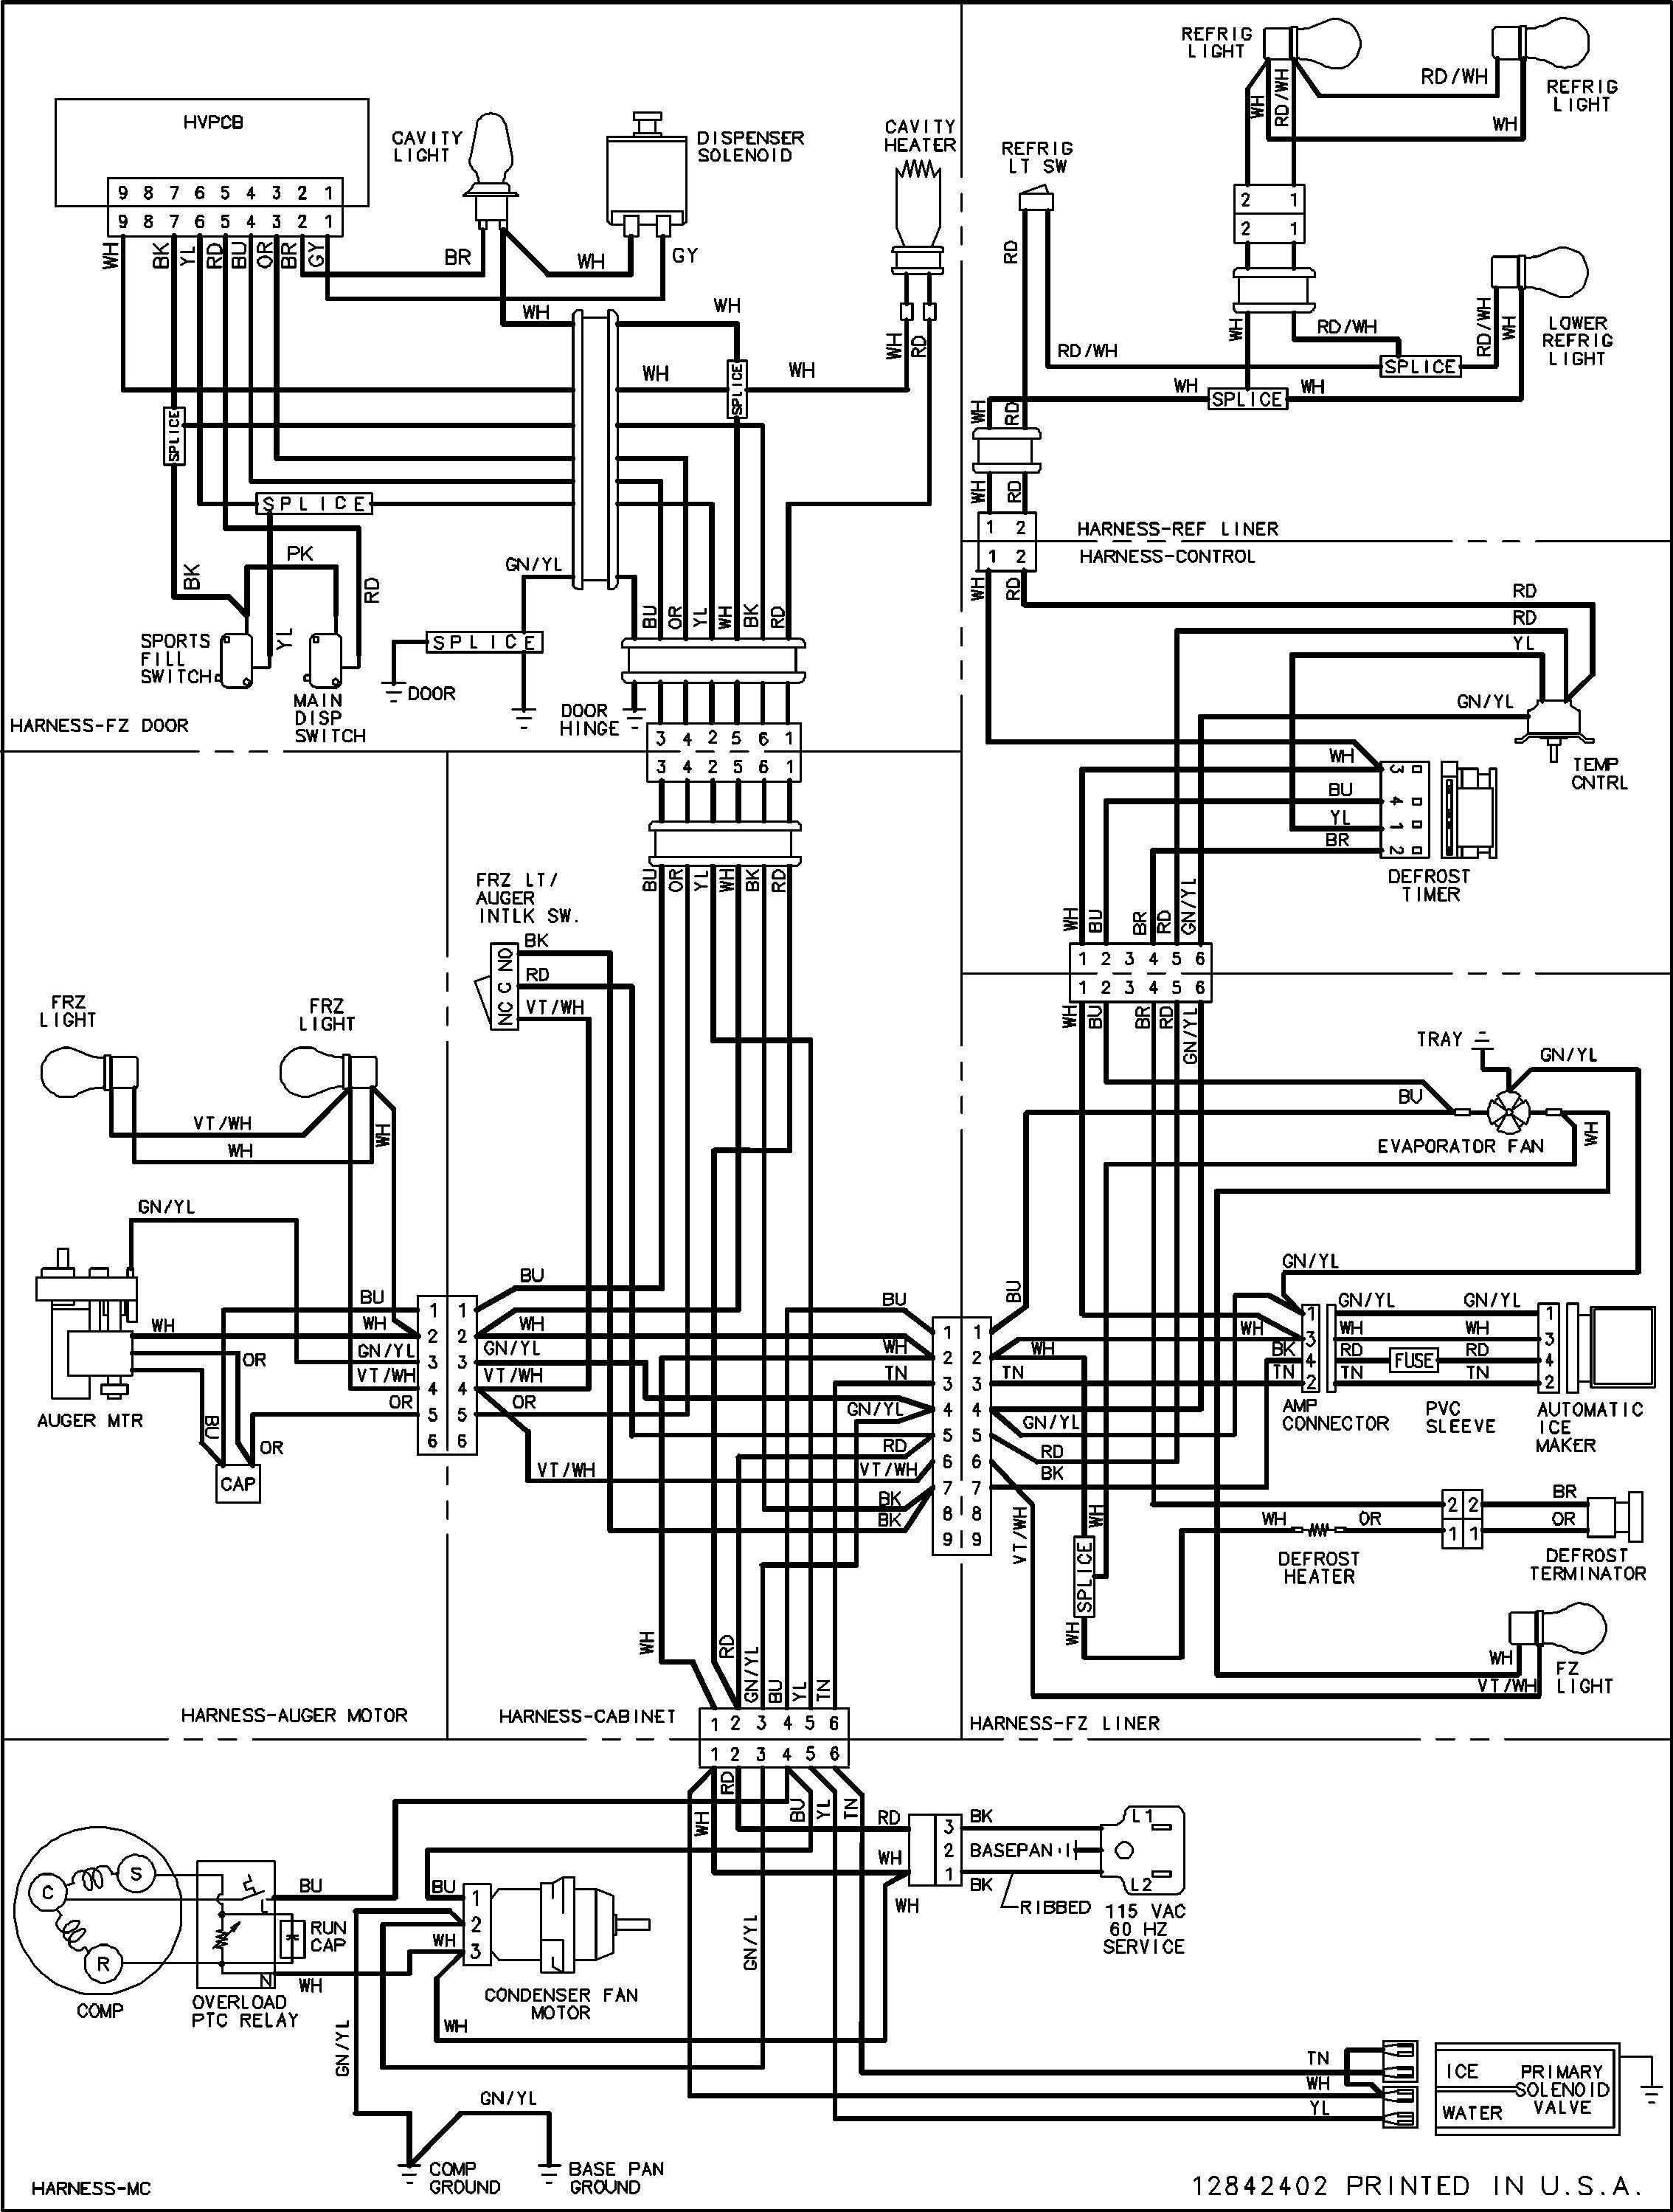 Wire Diagram for Samsung Dryer Model Dve52m8650v/a3 Collection Samsung Refrigerator Wiring Diagram Sample Of Wire Diagram for Samsung Dryer Model Dve52m8650v/a3